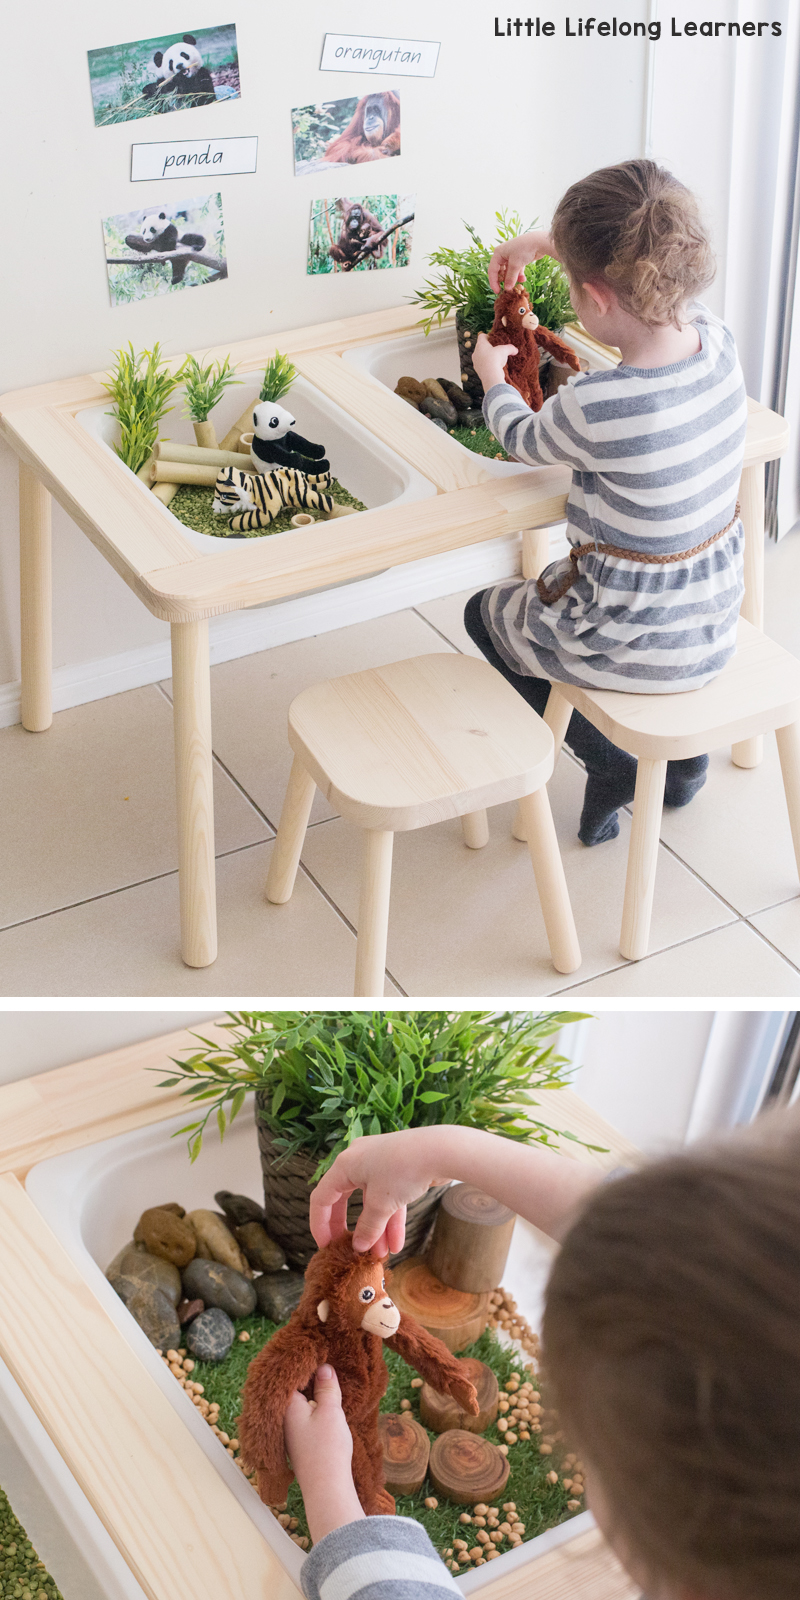 mesa de experimentacion - actividades estimulacion sensorial para niños - sensory play activities for children